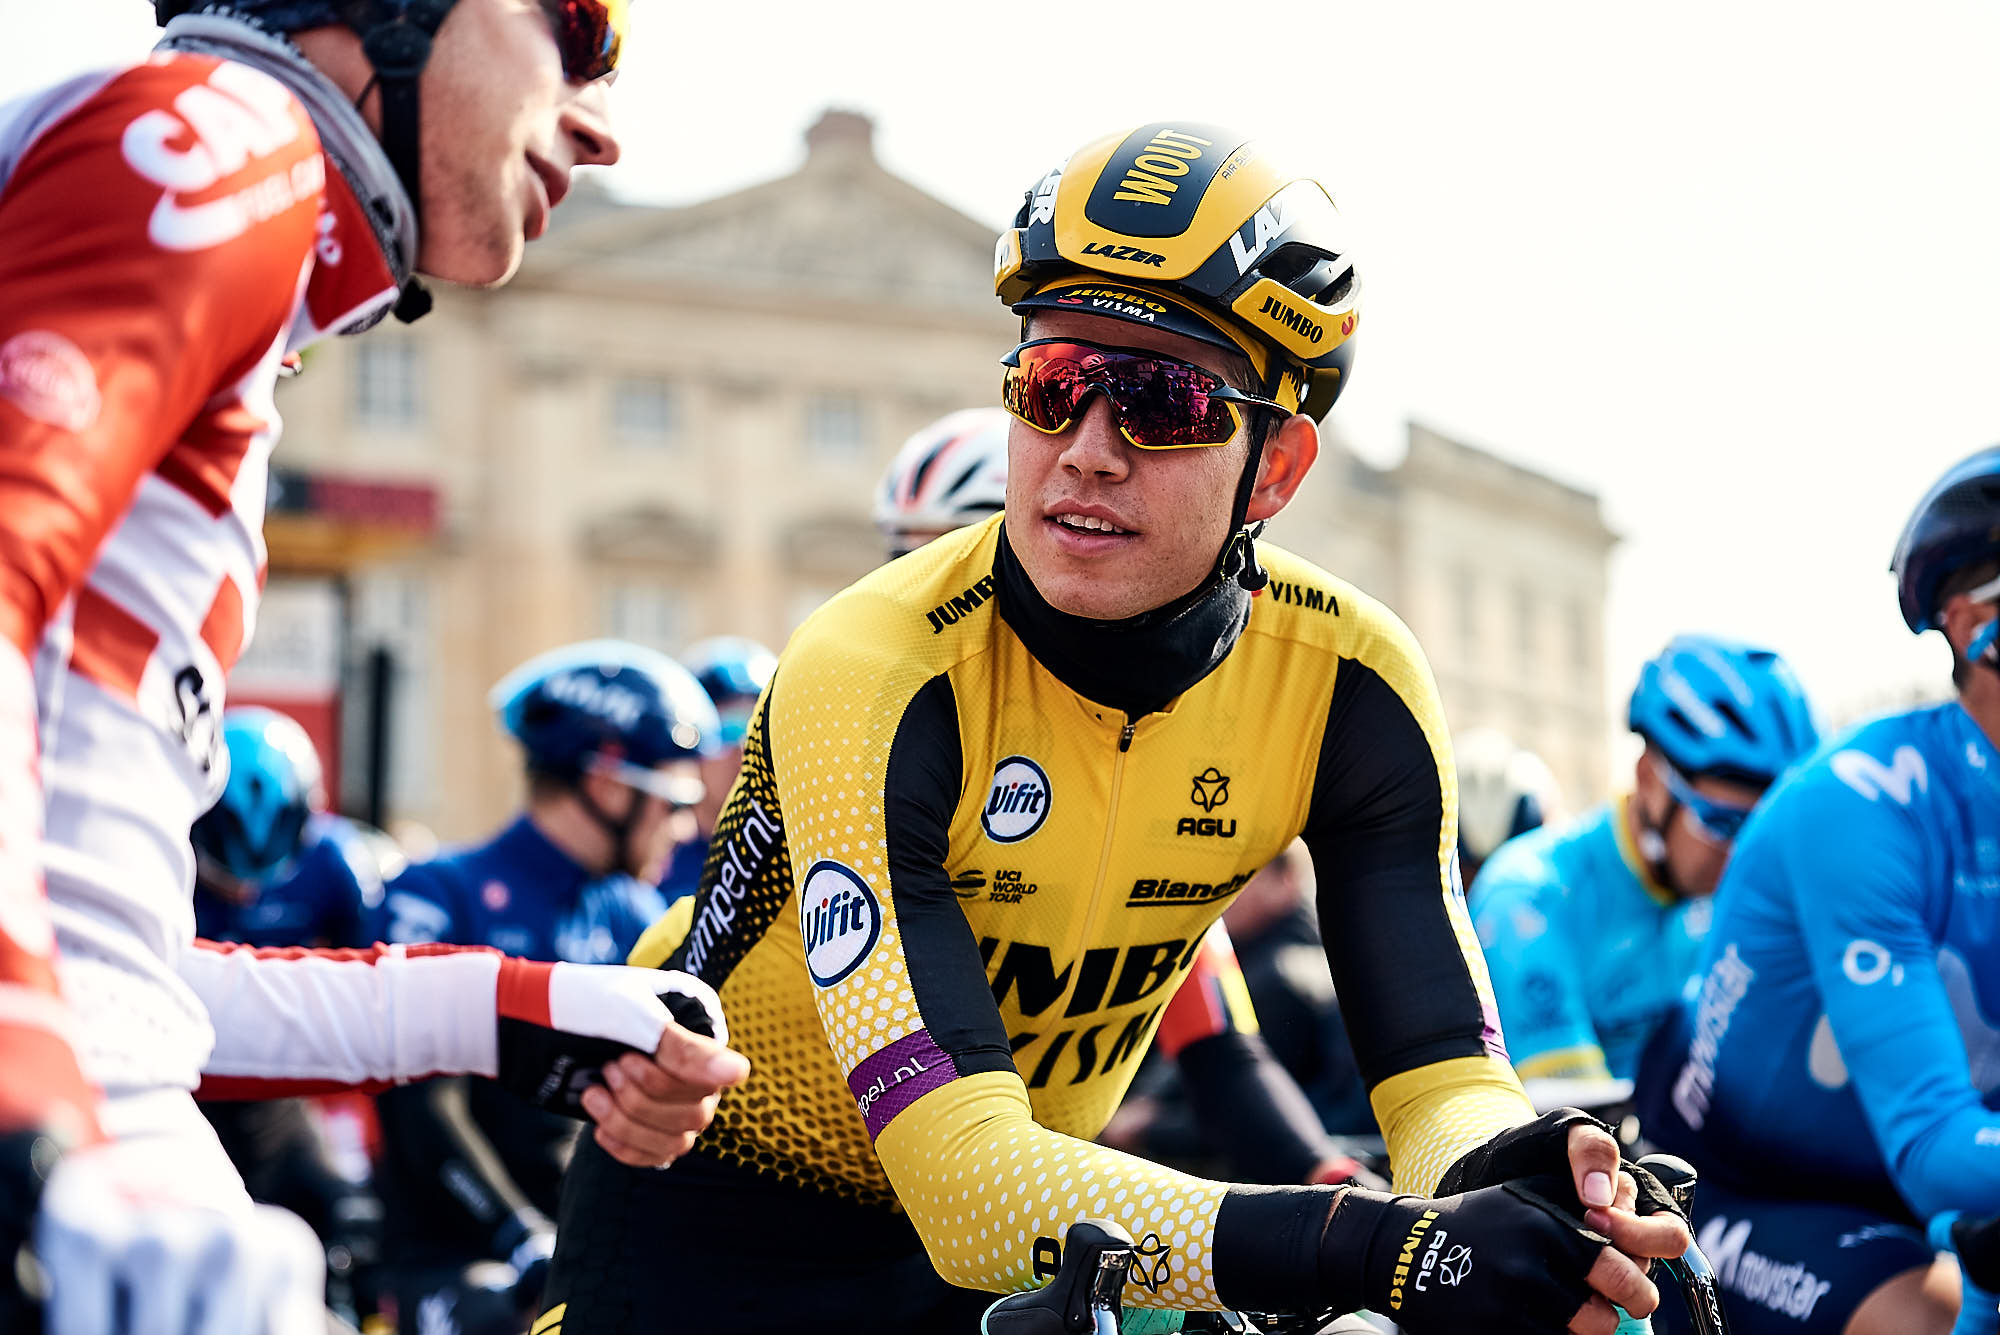 Wout van Aert talking with fellow riders before Paris-Roubaix